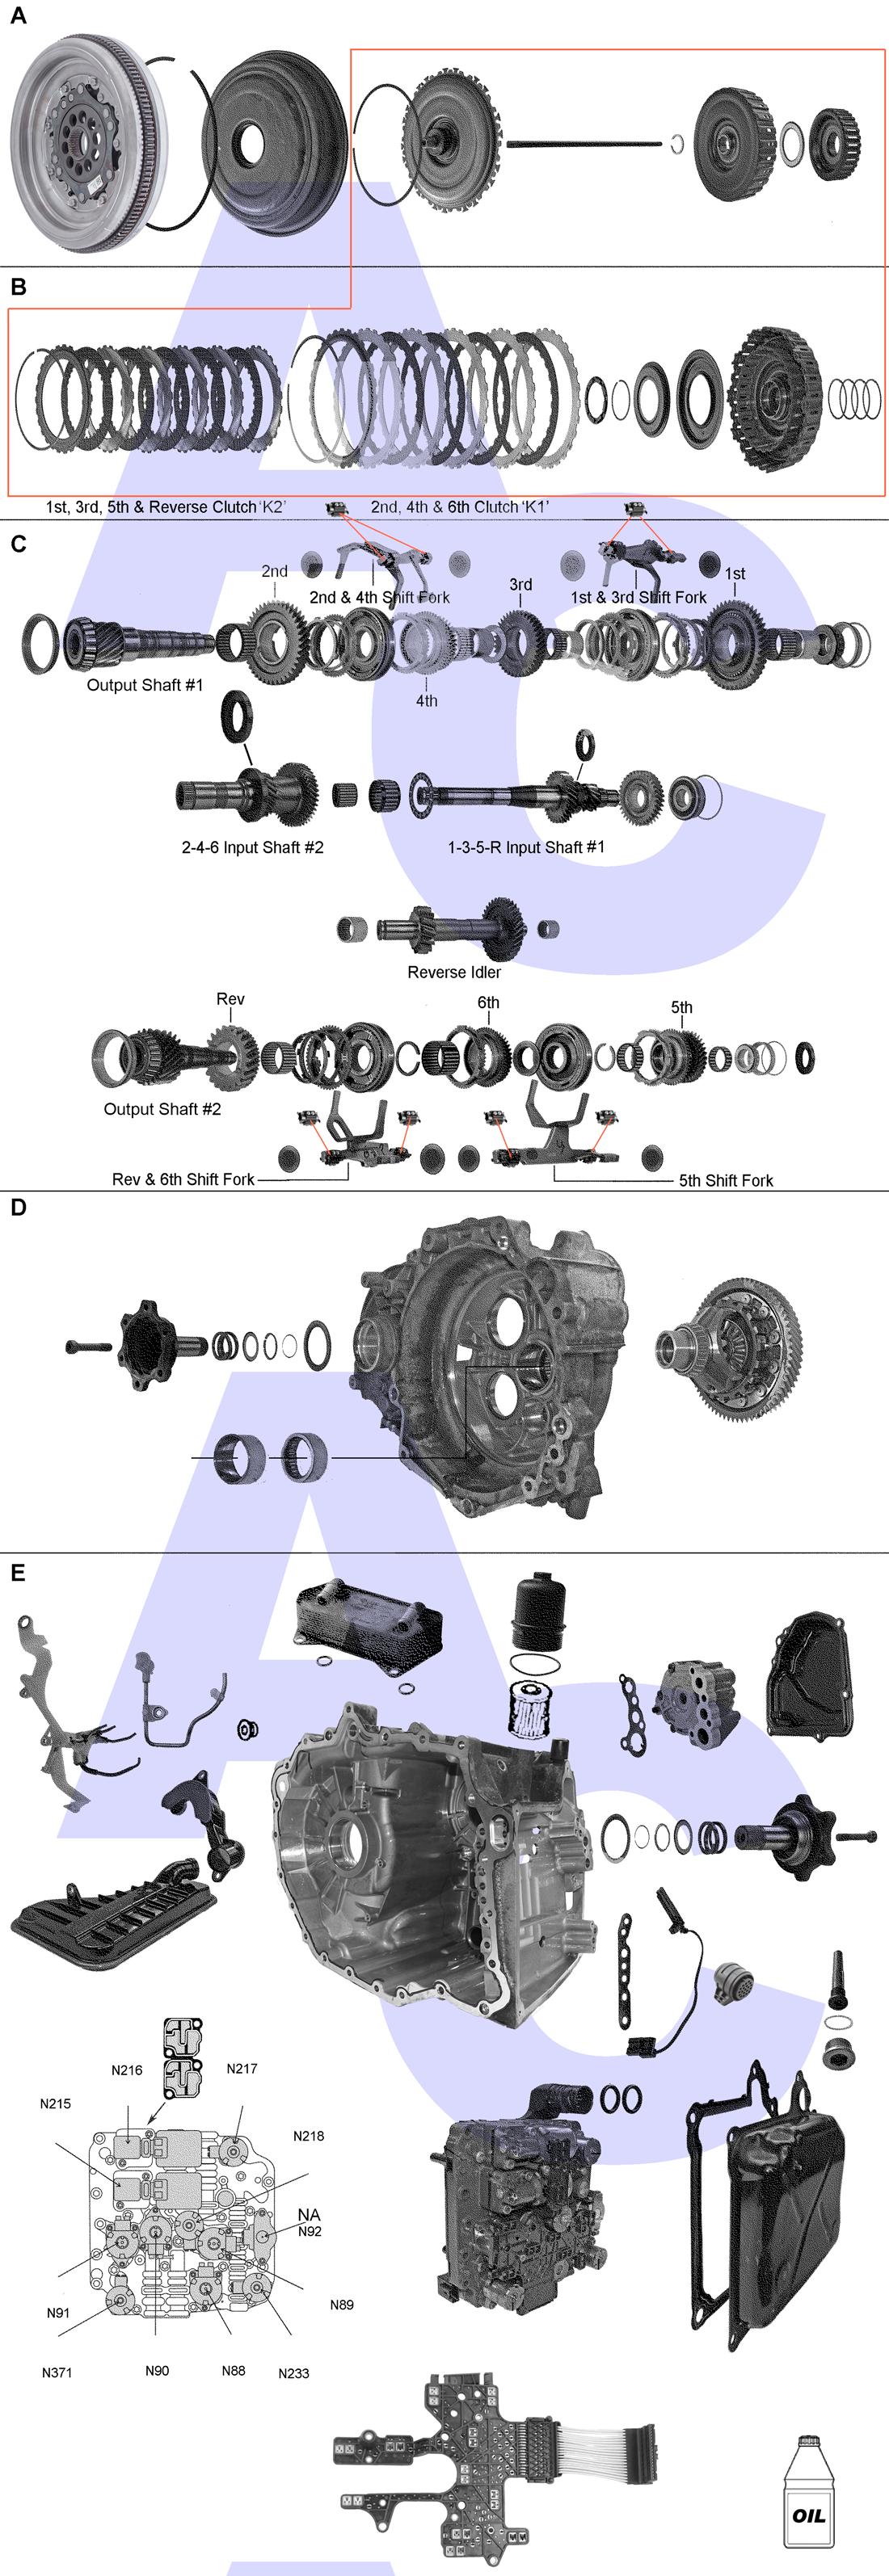 02E Dual Clutch Transmission Parts Catalogue - Automatic Choice